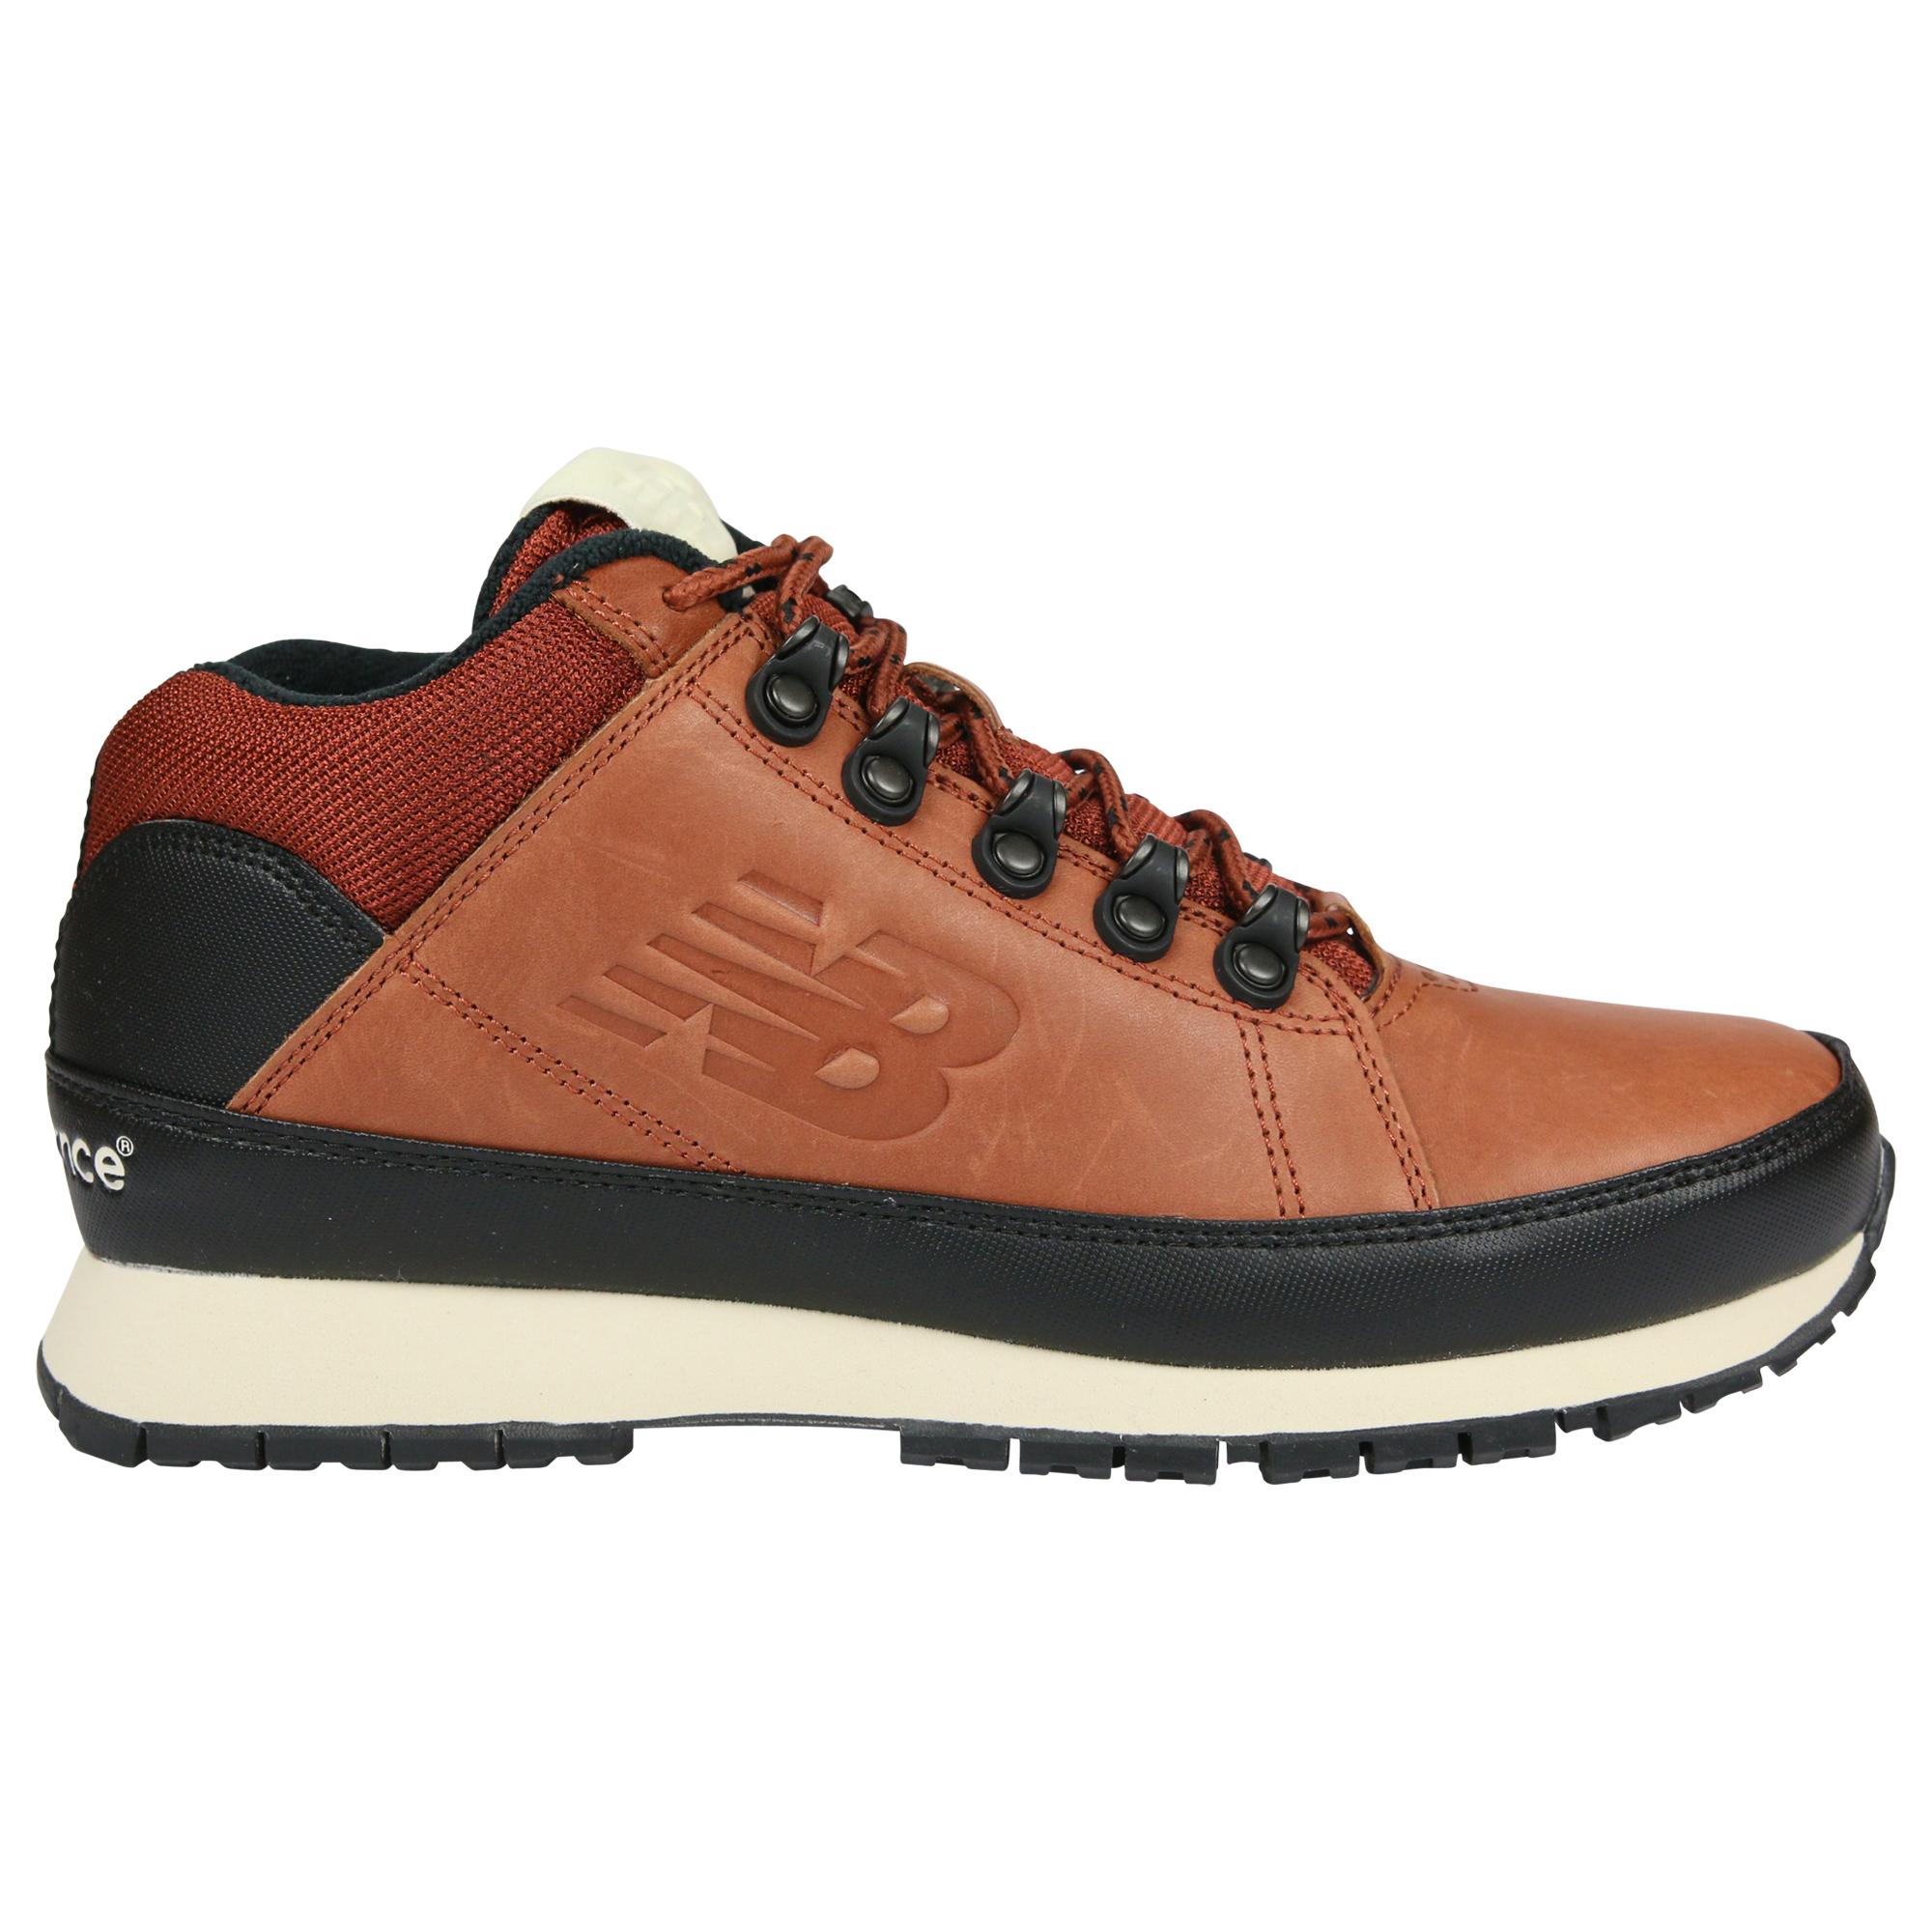 new balance 754 boots schuhe winterschuhe winterstiefel. Black Bedroom Furniture Sets. Home Design Ideas